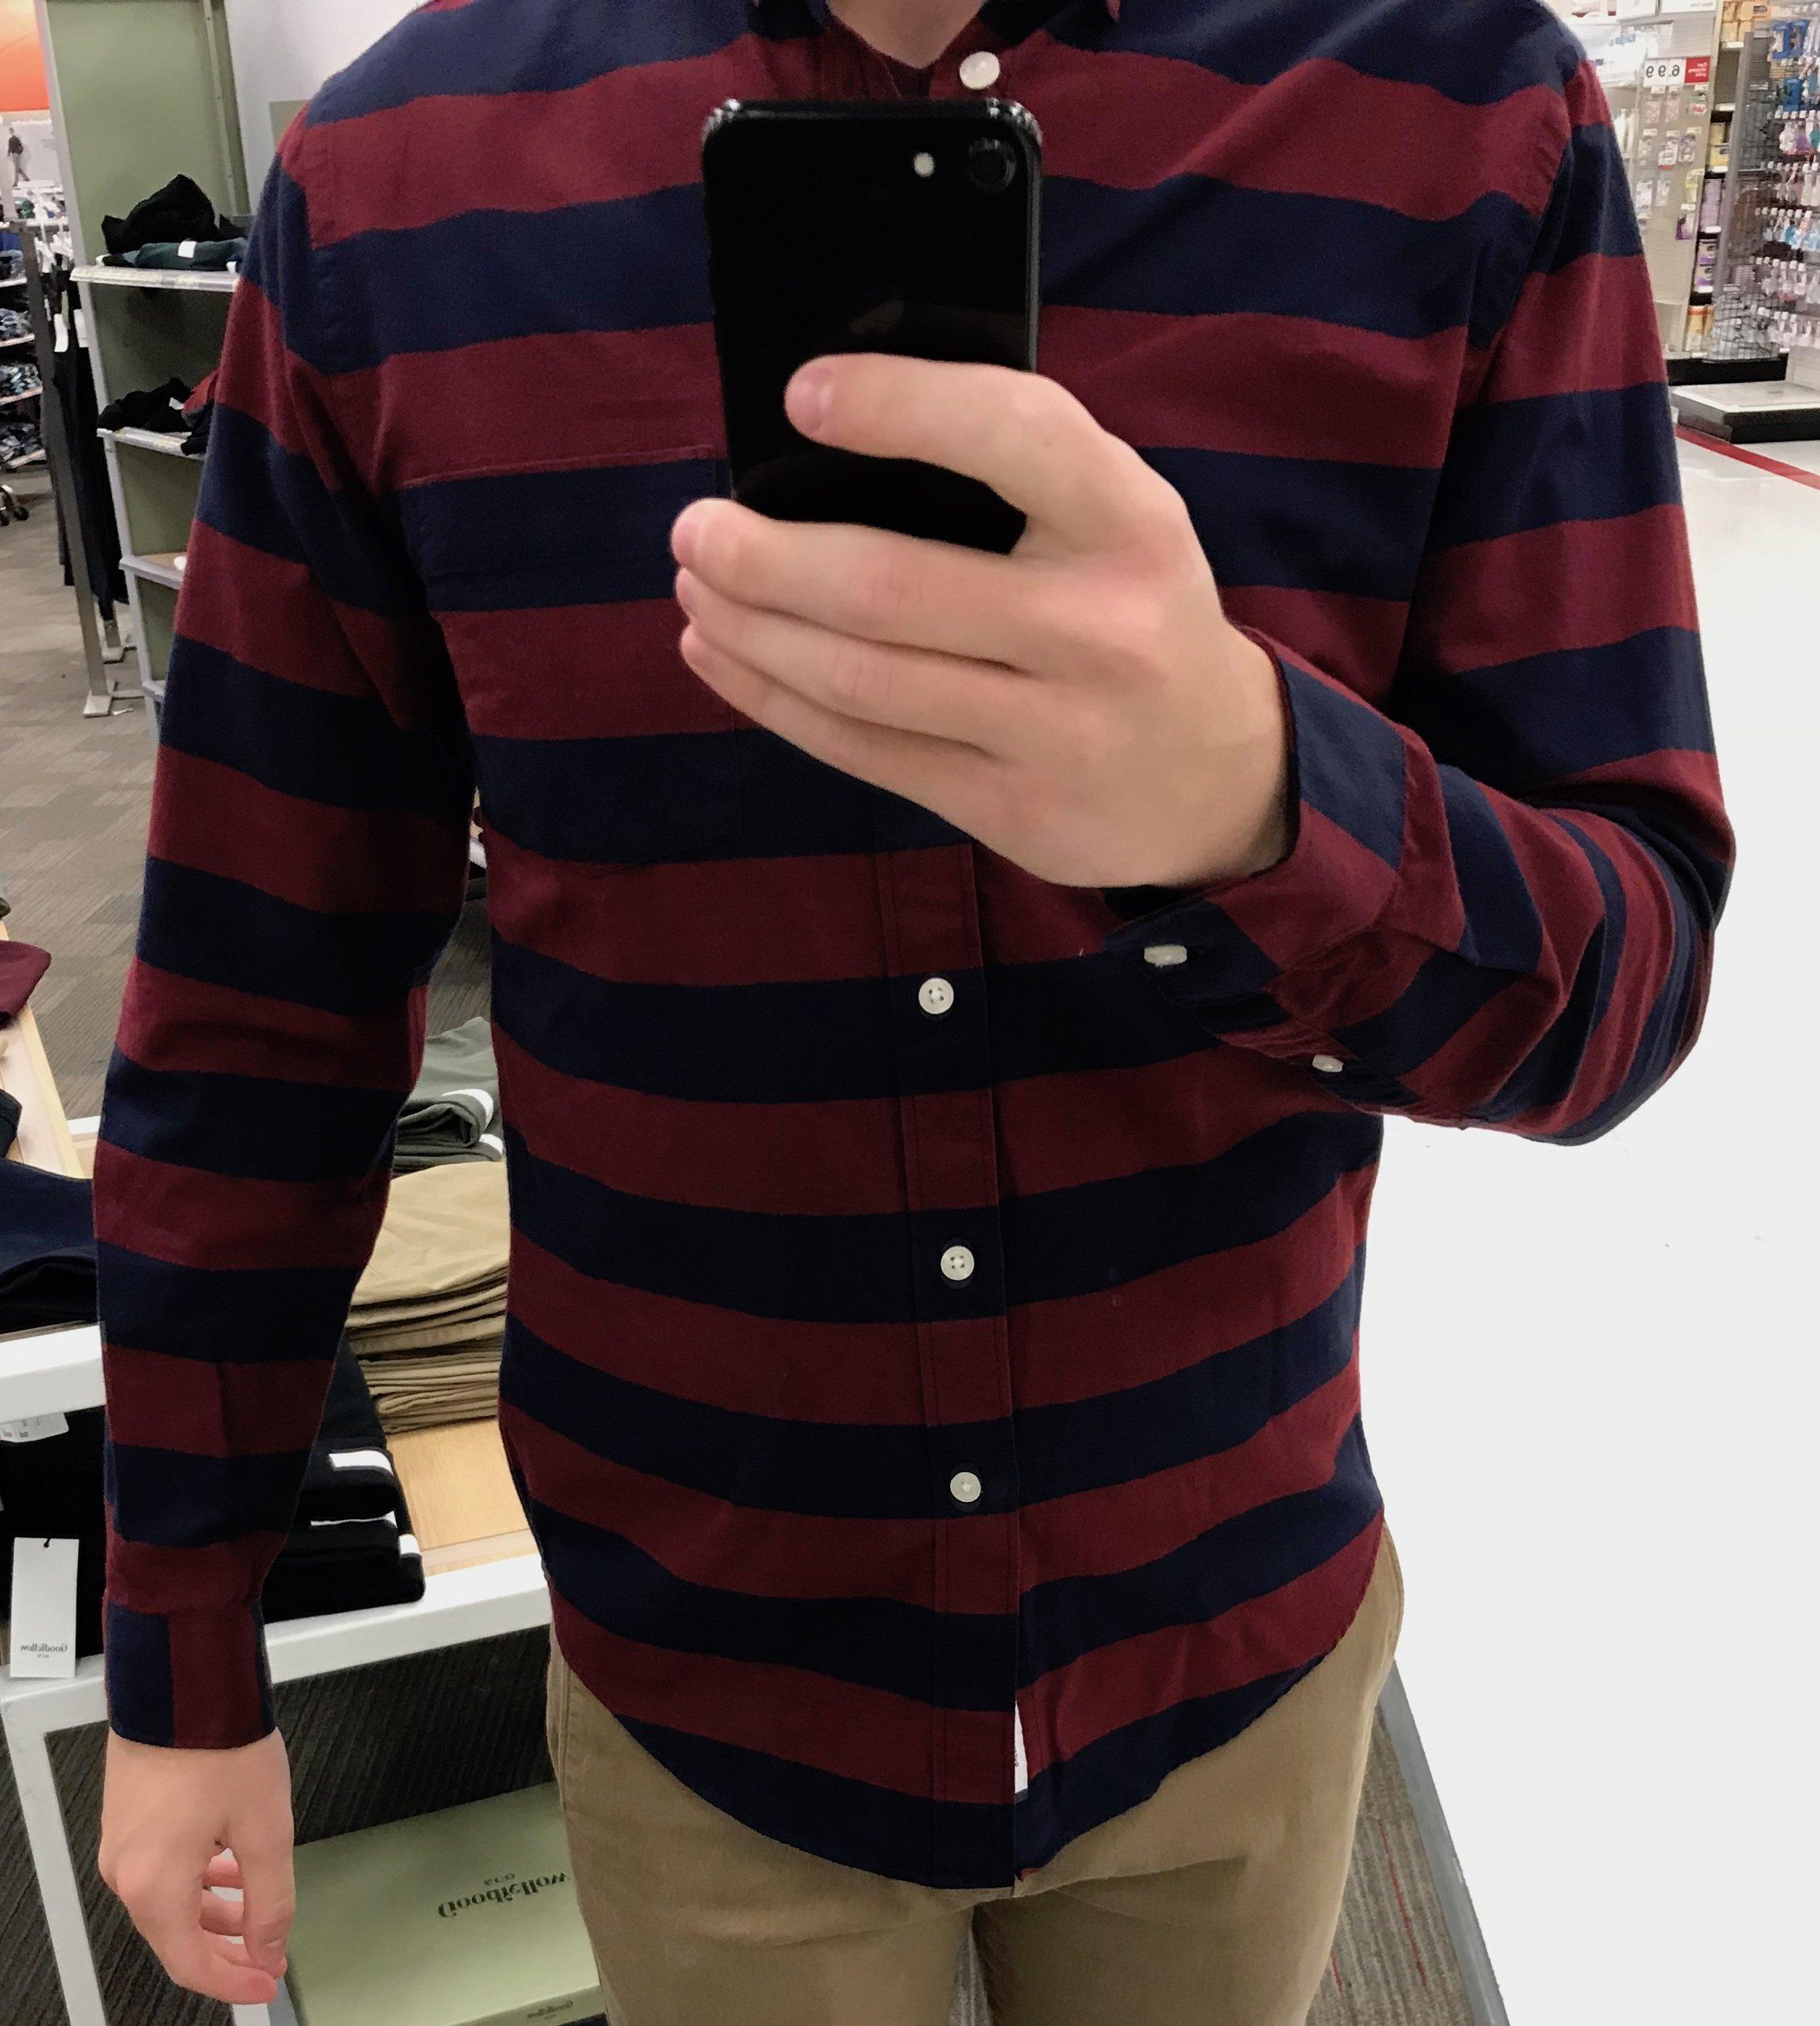 Standard Fit Striped Oxford Shirt - $24.99